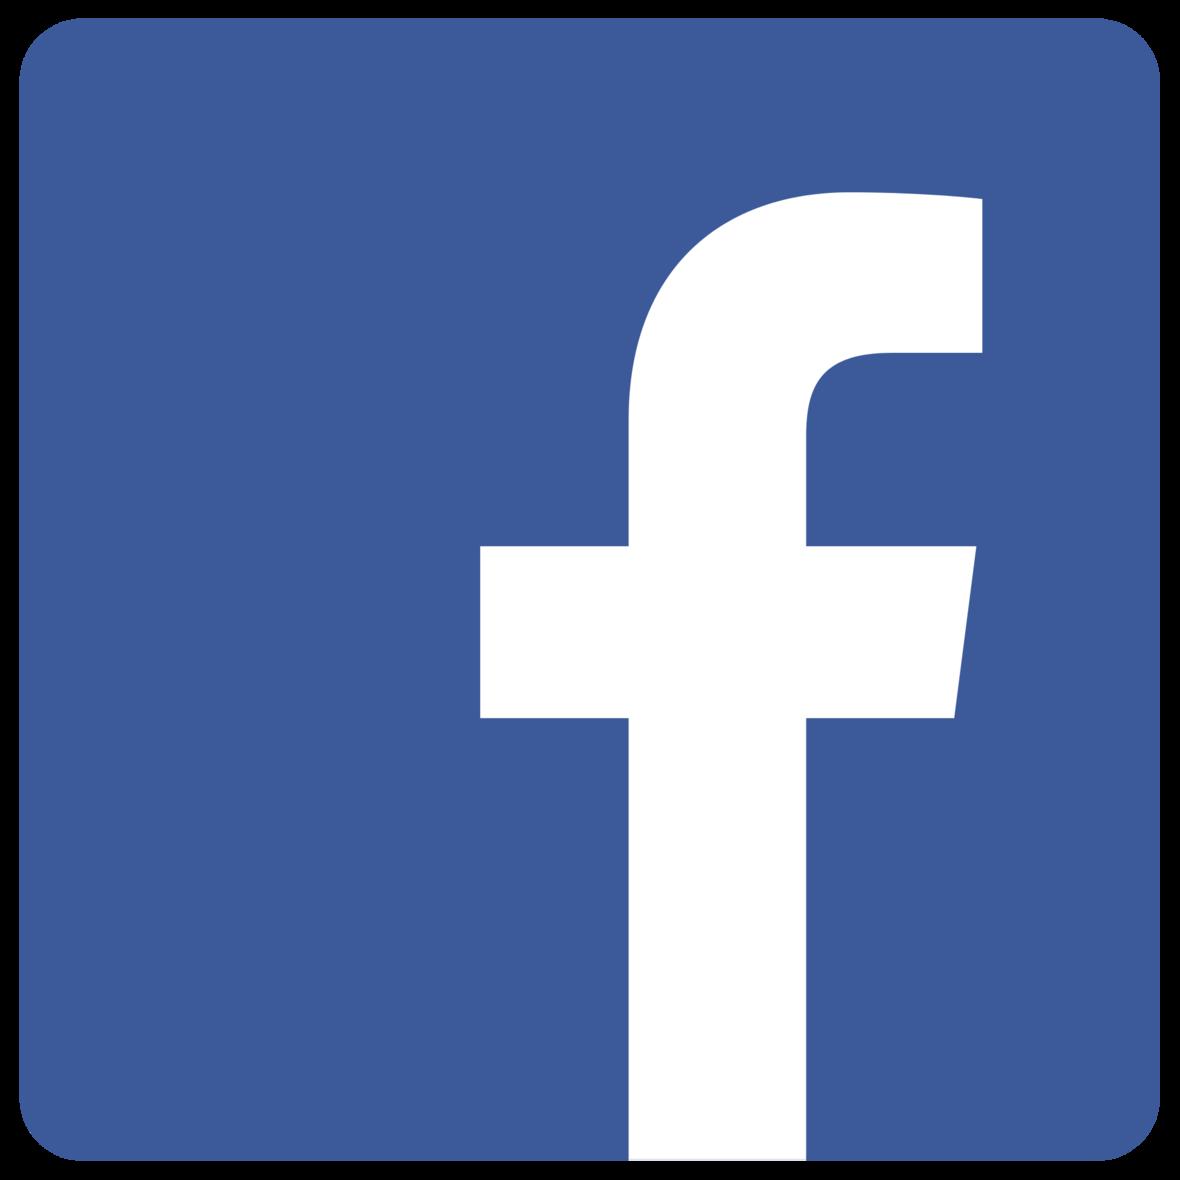 facebook-icon-transparent-background-3